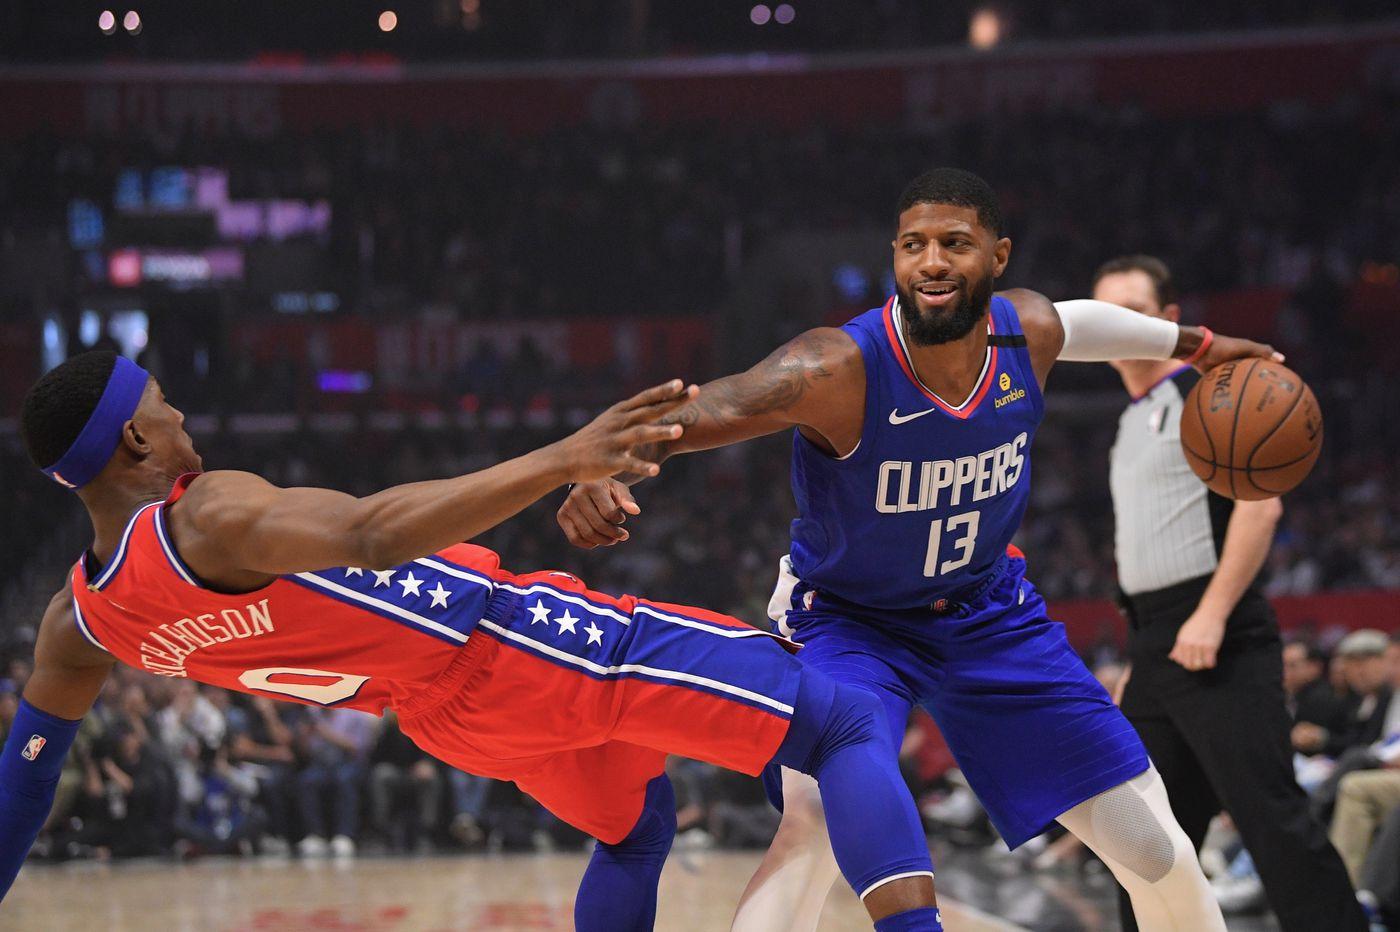 NBA power rankings: Sixers stay in top 10 despite two losses in last week